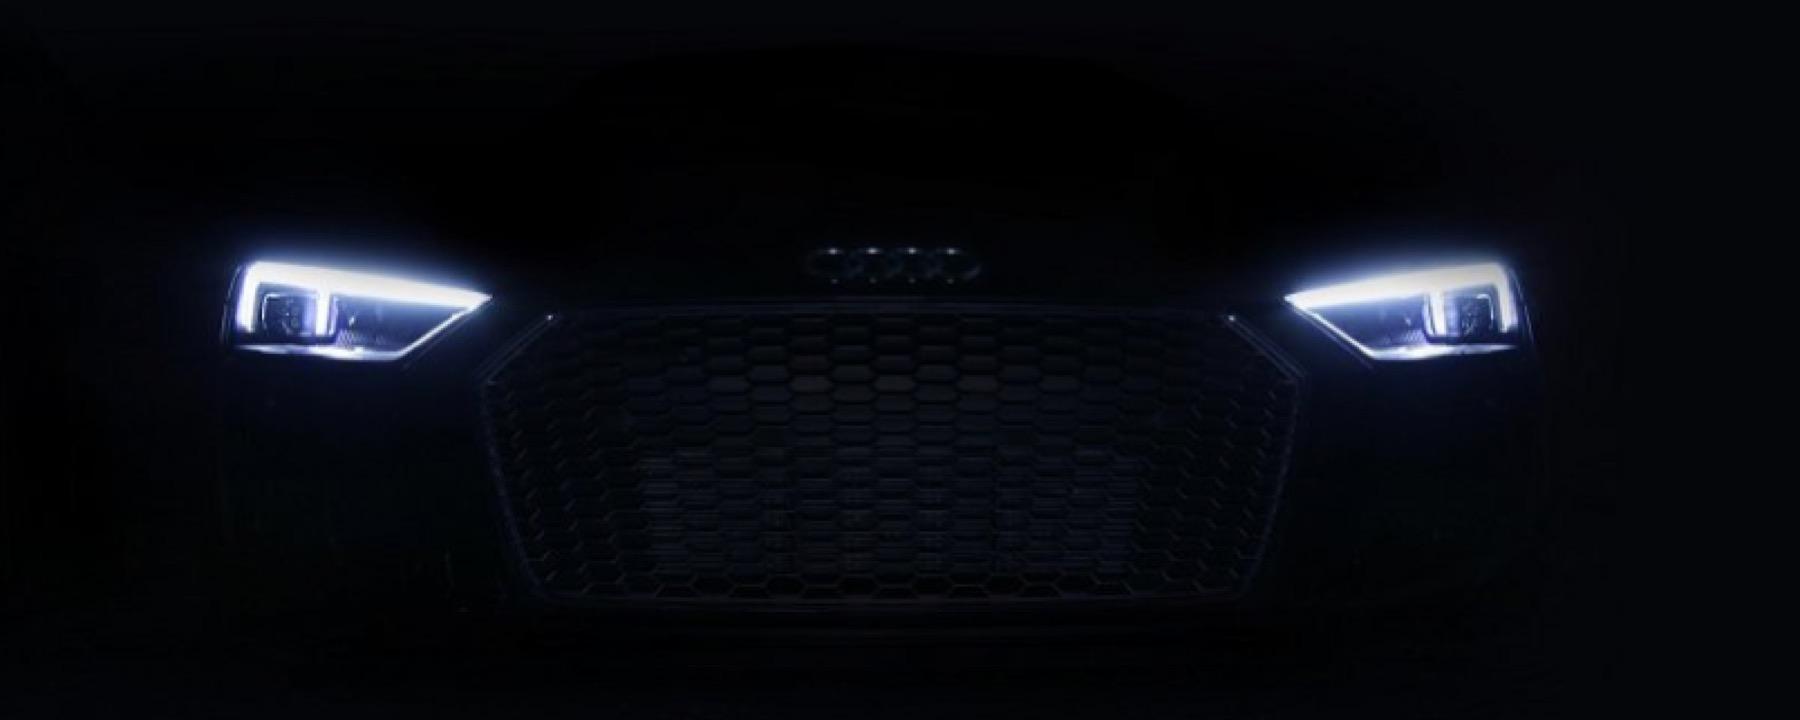 Audi Announces New Laser Lights IndiGO Auto Group Blog - Car laser light show